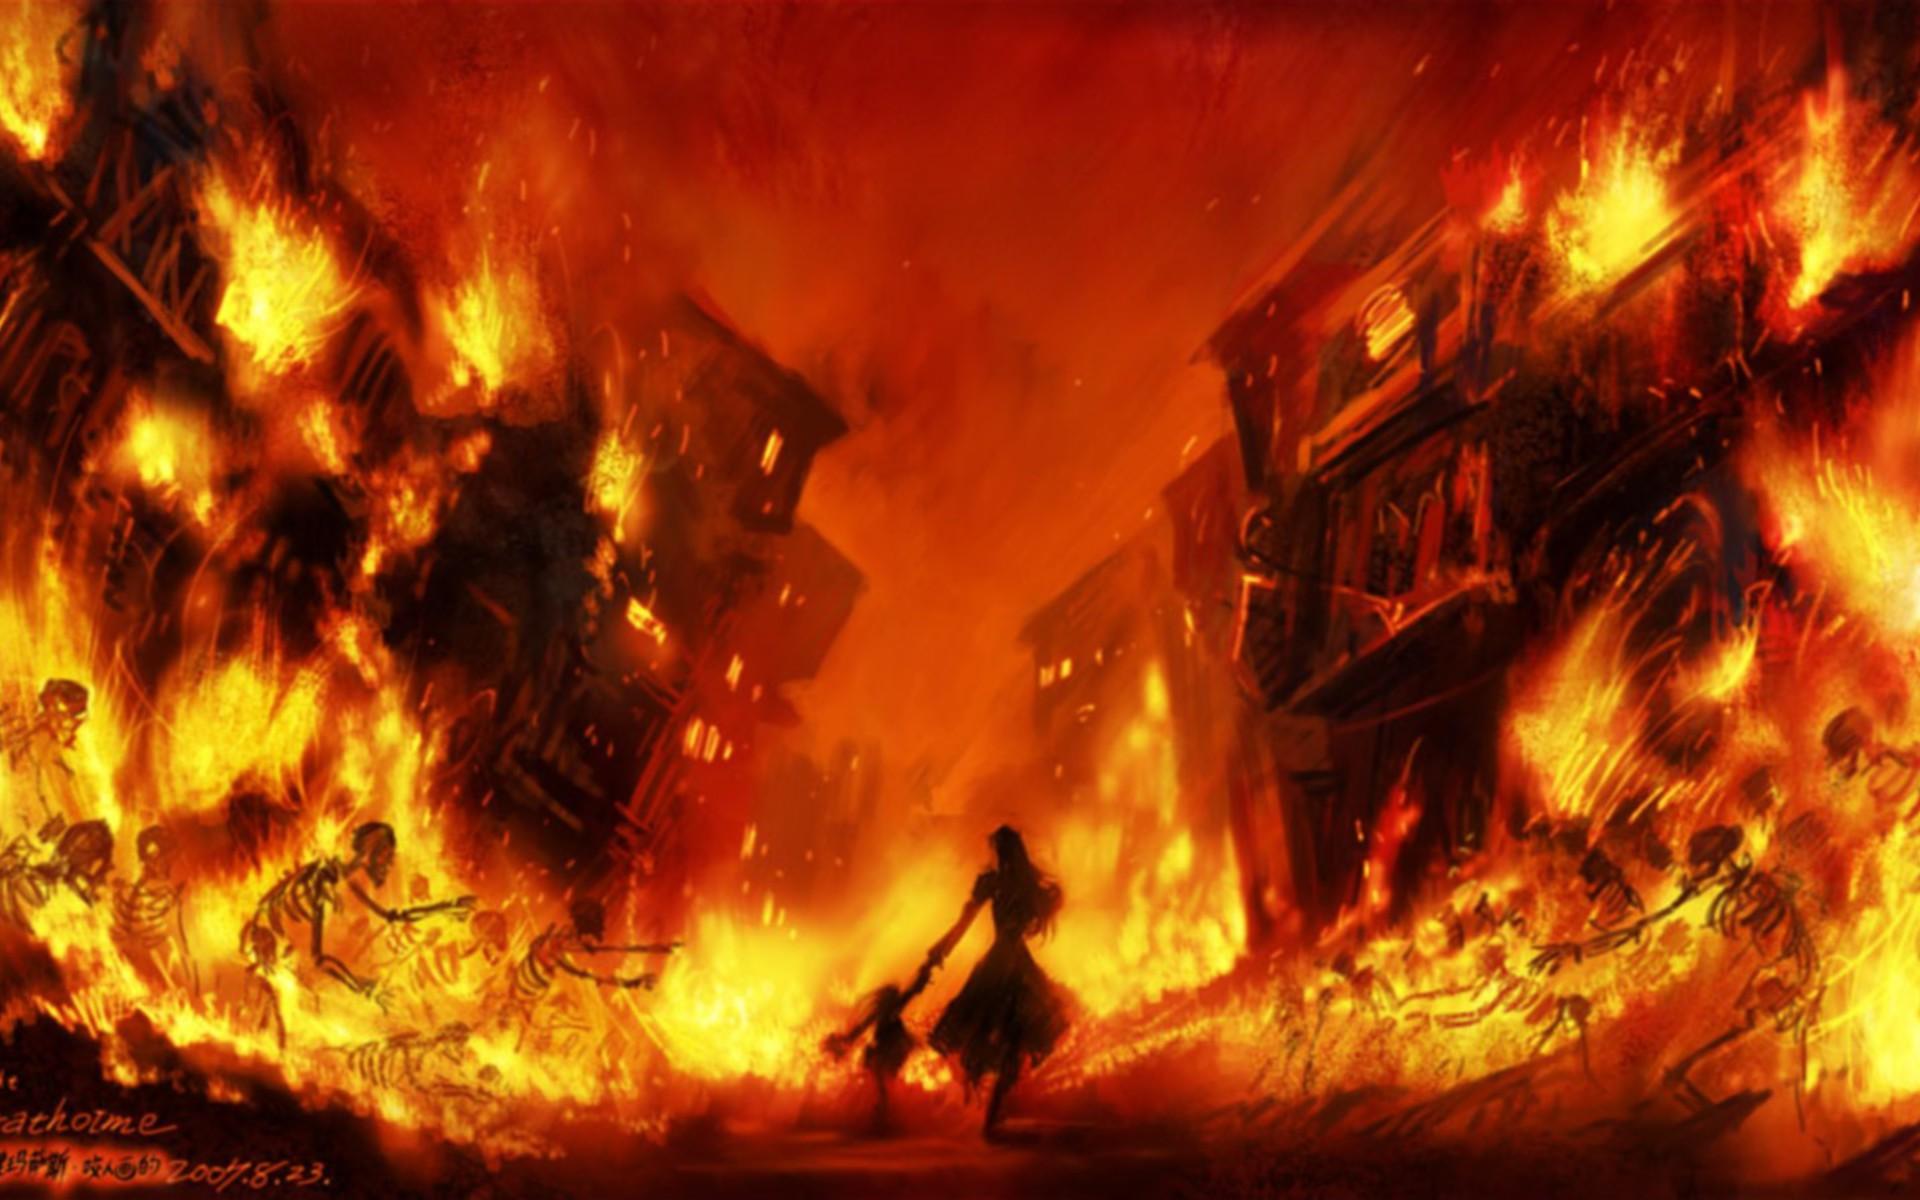 scene_-_khalsbrad_burning.jpg